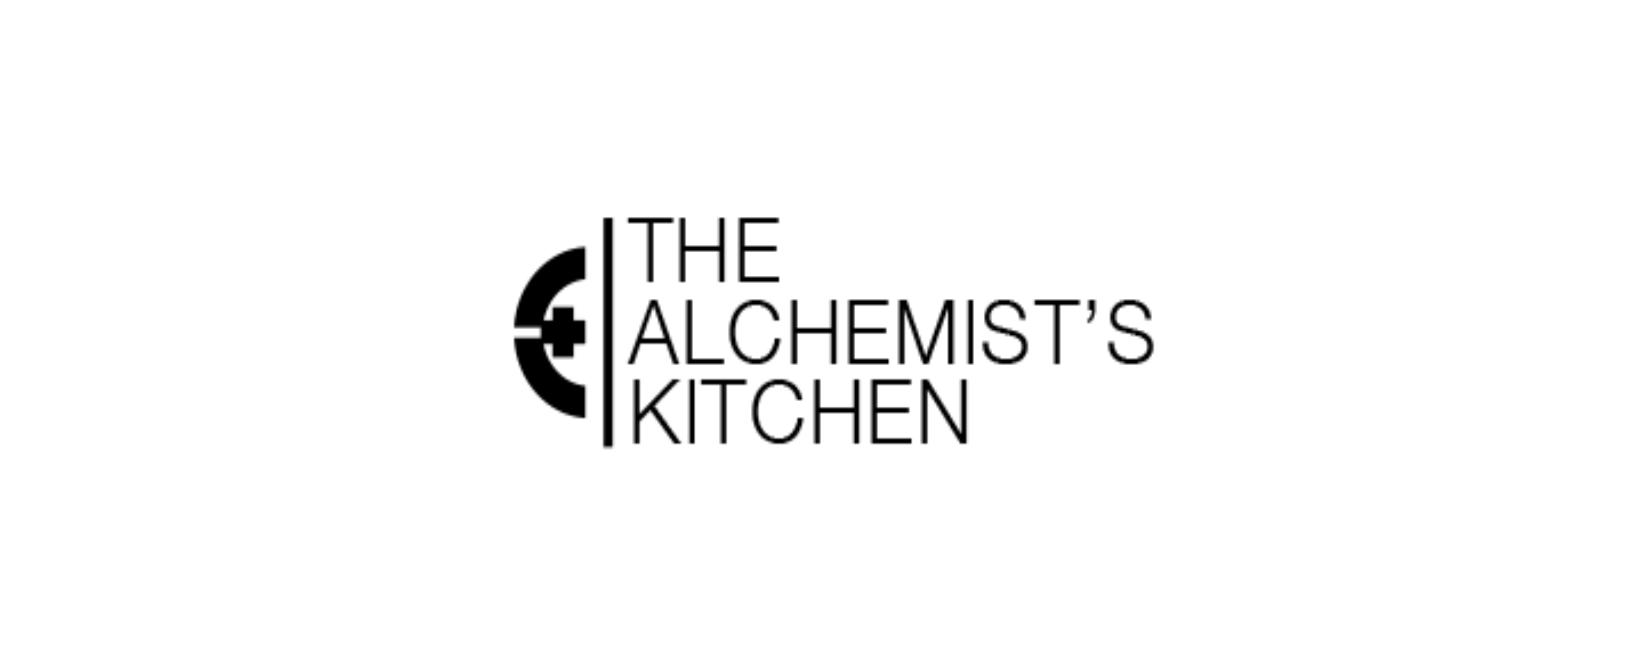 The Alchemists Kitchen Discount Code 2021